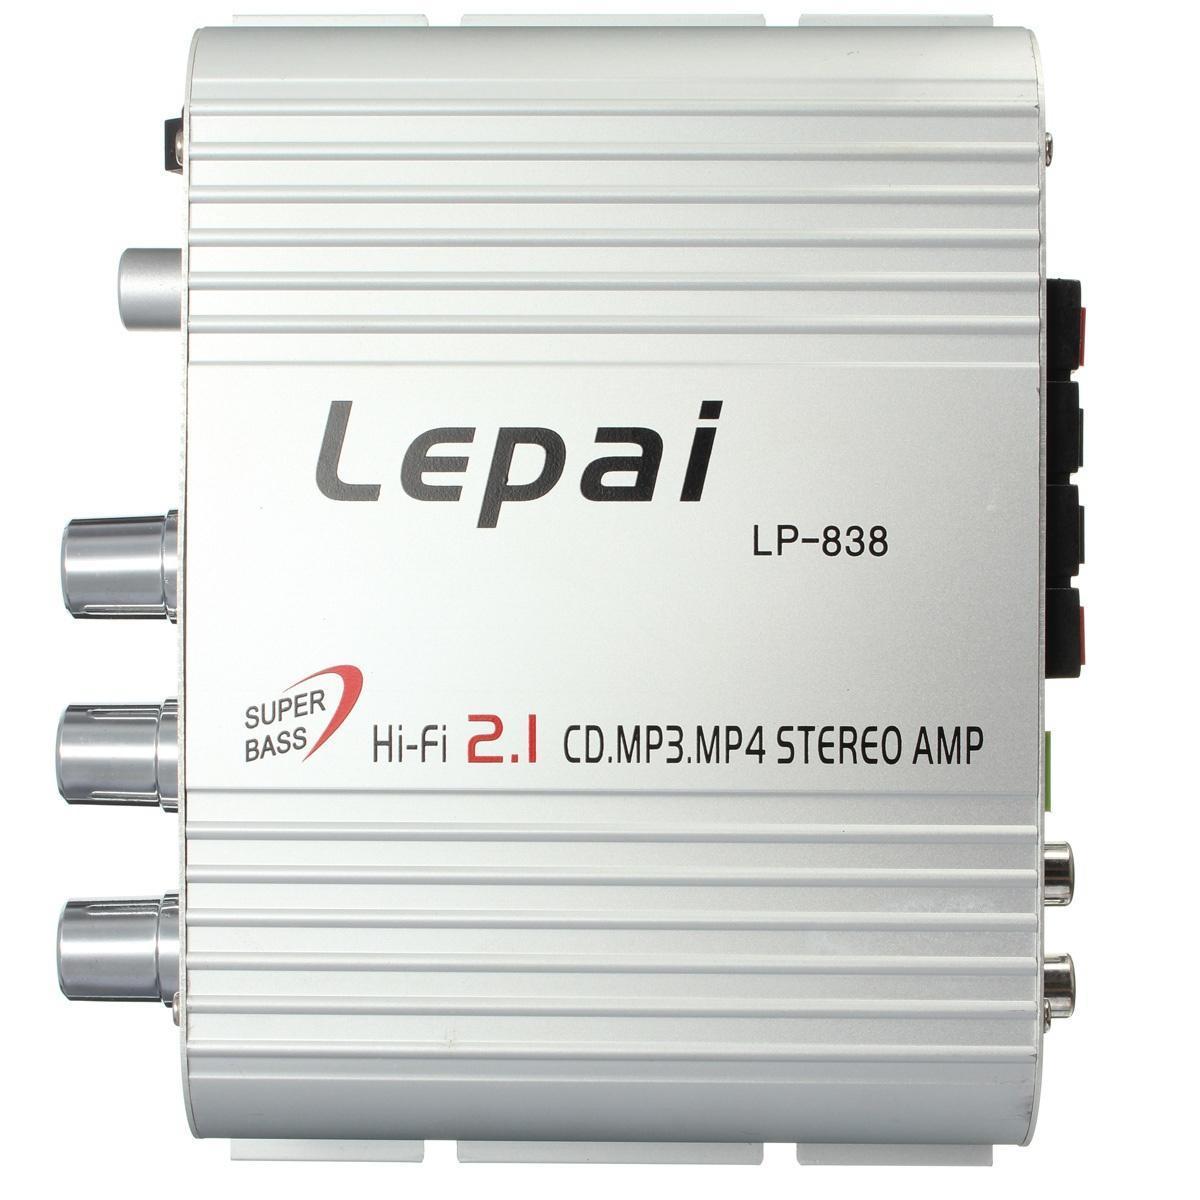 Звука LePai LP-838 мини Hi-Fi 2.1 CD MP3 мотоцикл автомобиль аудио стерео усилитель 12V aborted aborted retrogore lp cd